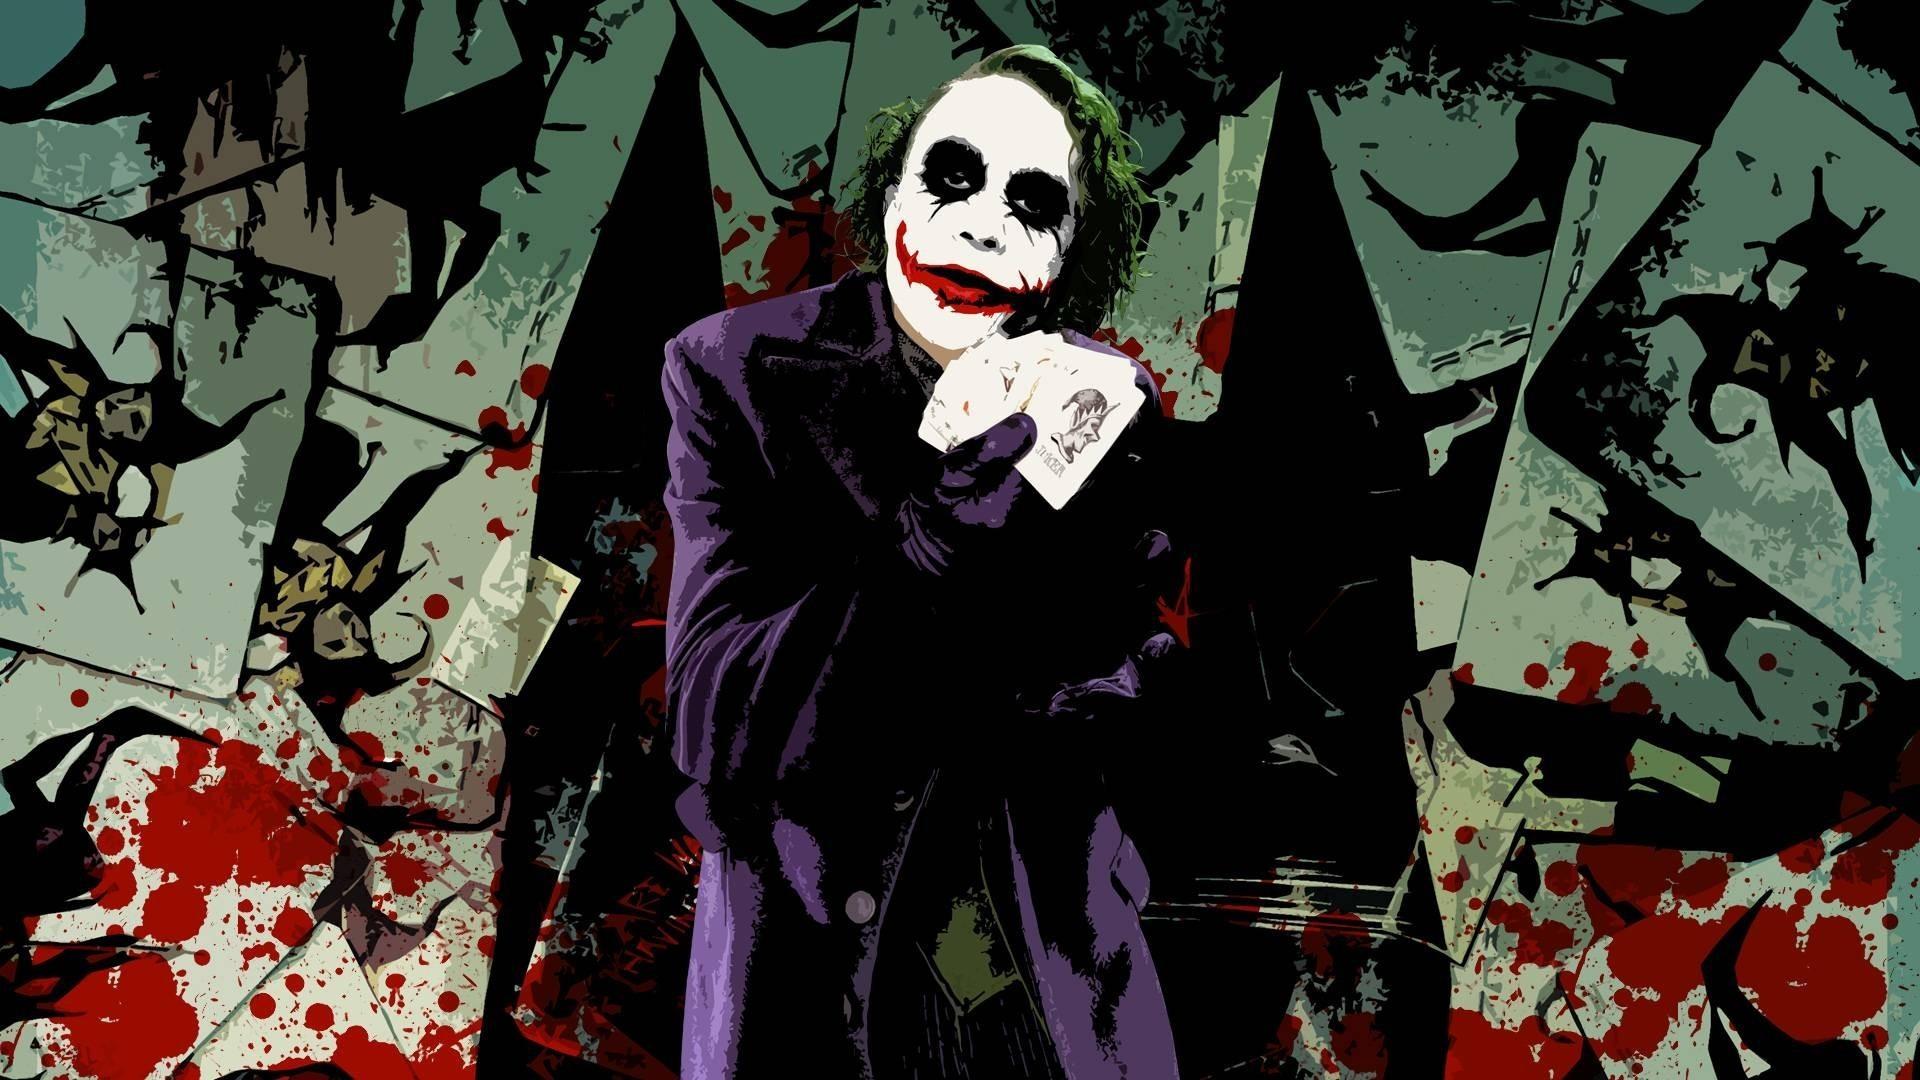 Hd Wallpapers Phone Wallpaper Heath Ledger Joker Dark Knight